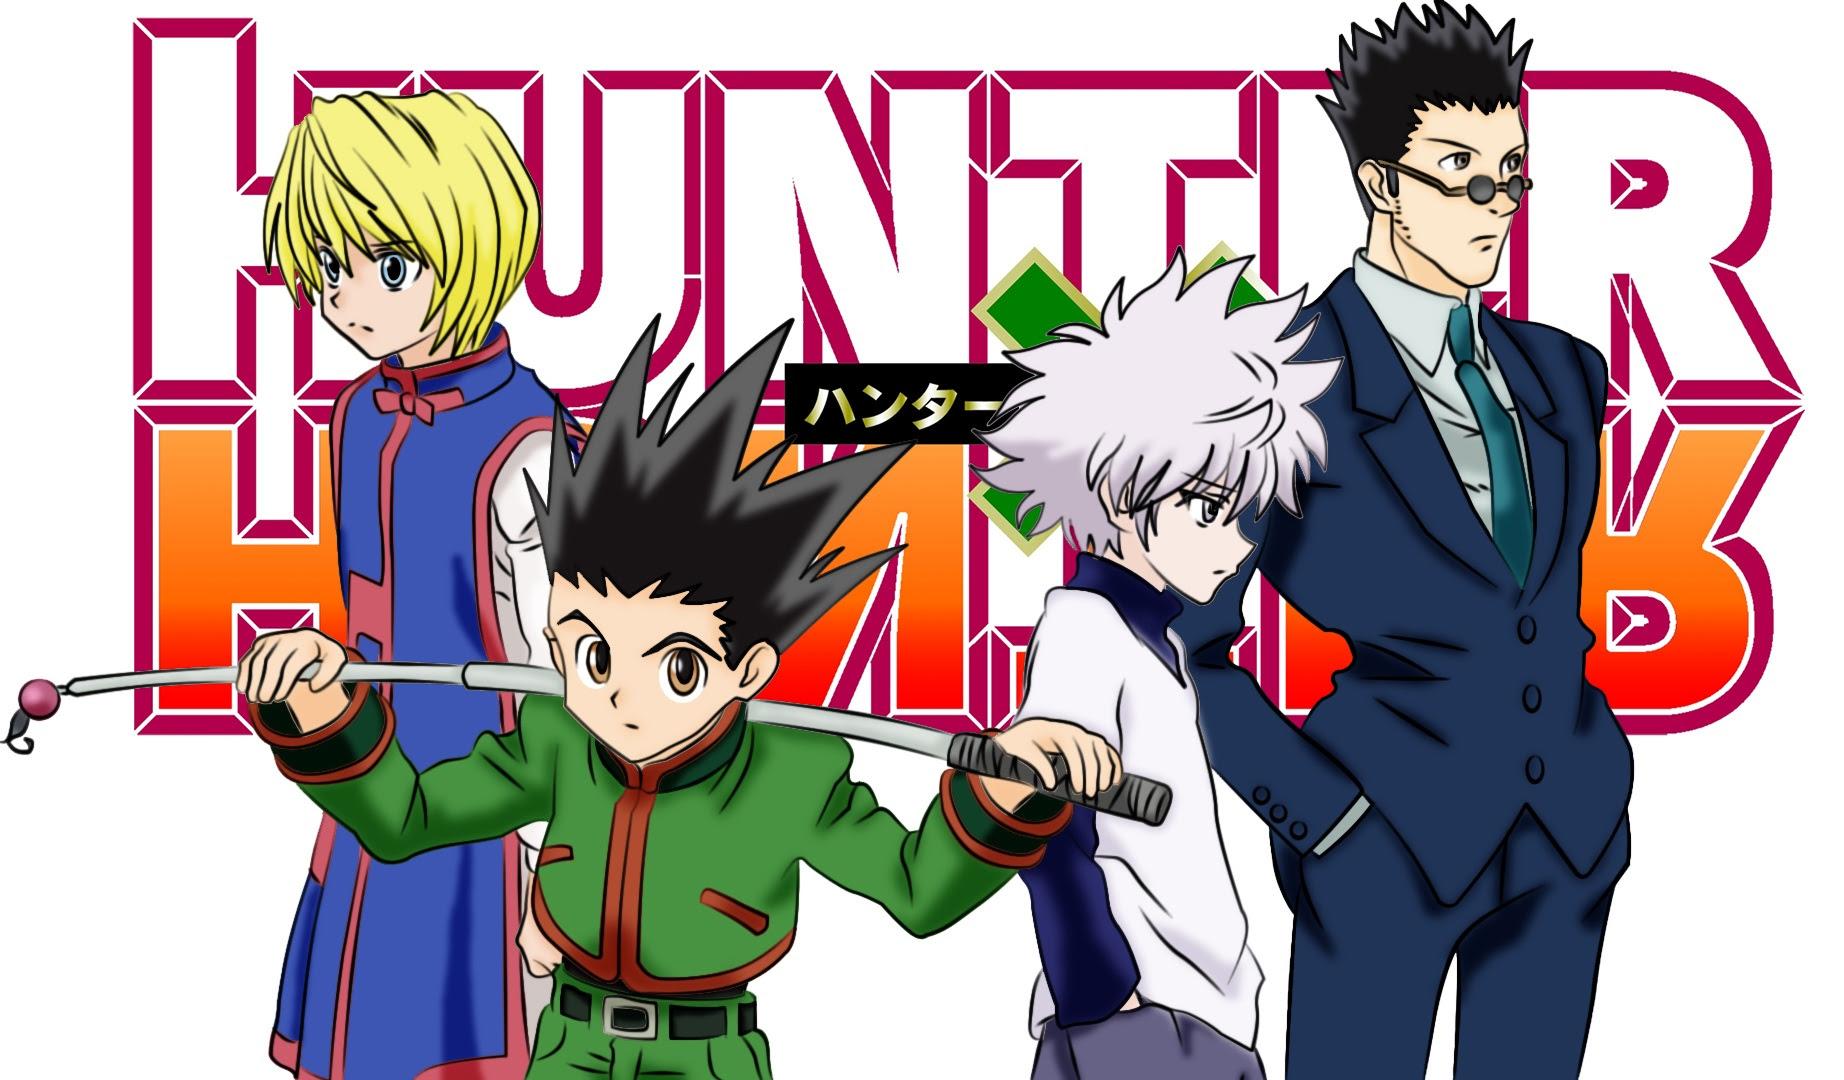 Hunter X Hunter Episode 55 Free Hd Wallpaper Animewp Com